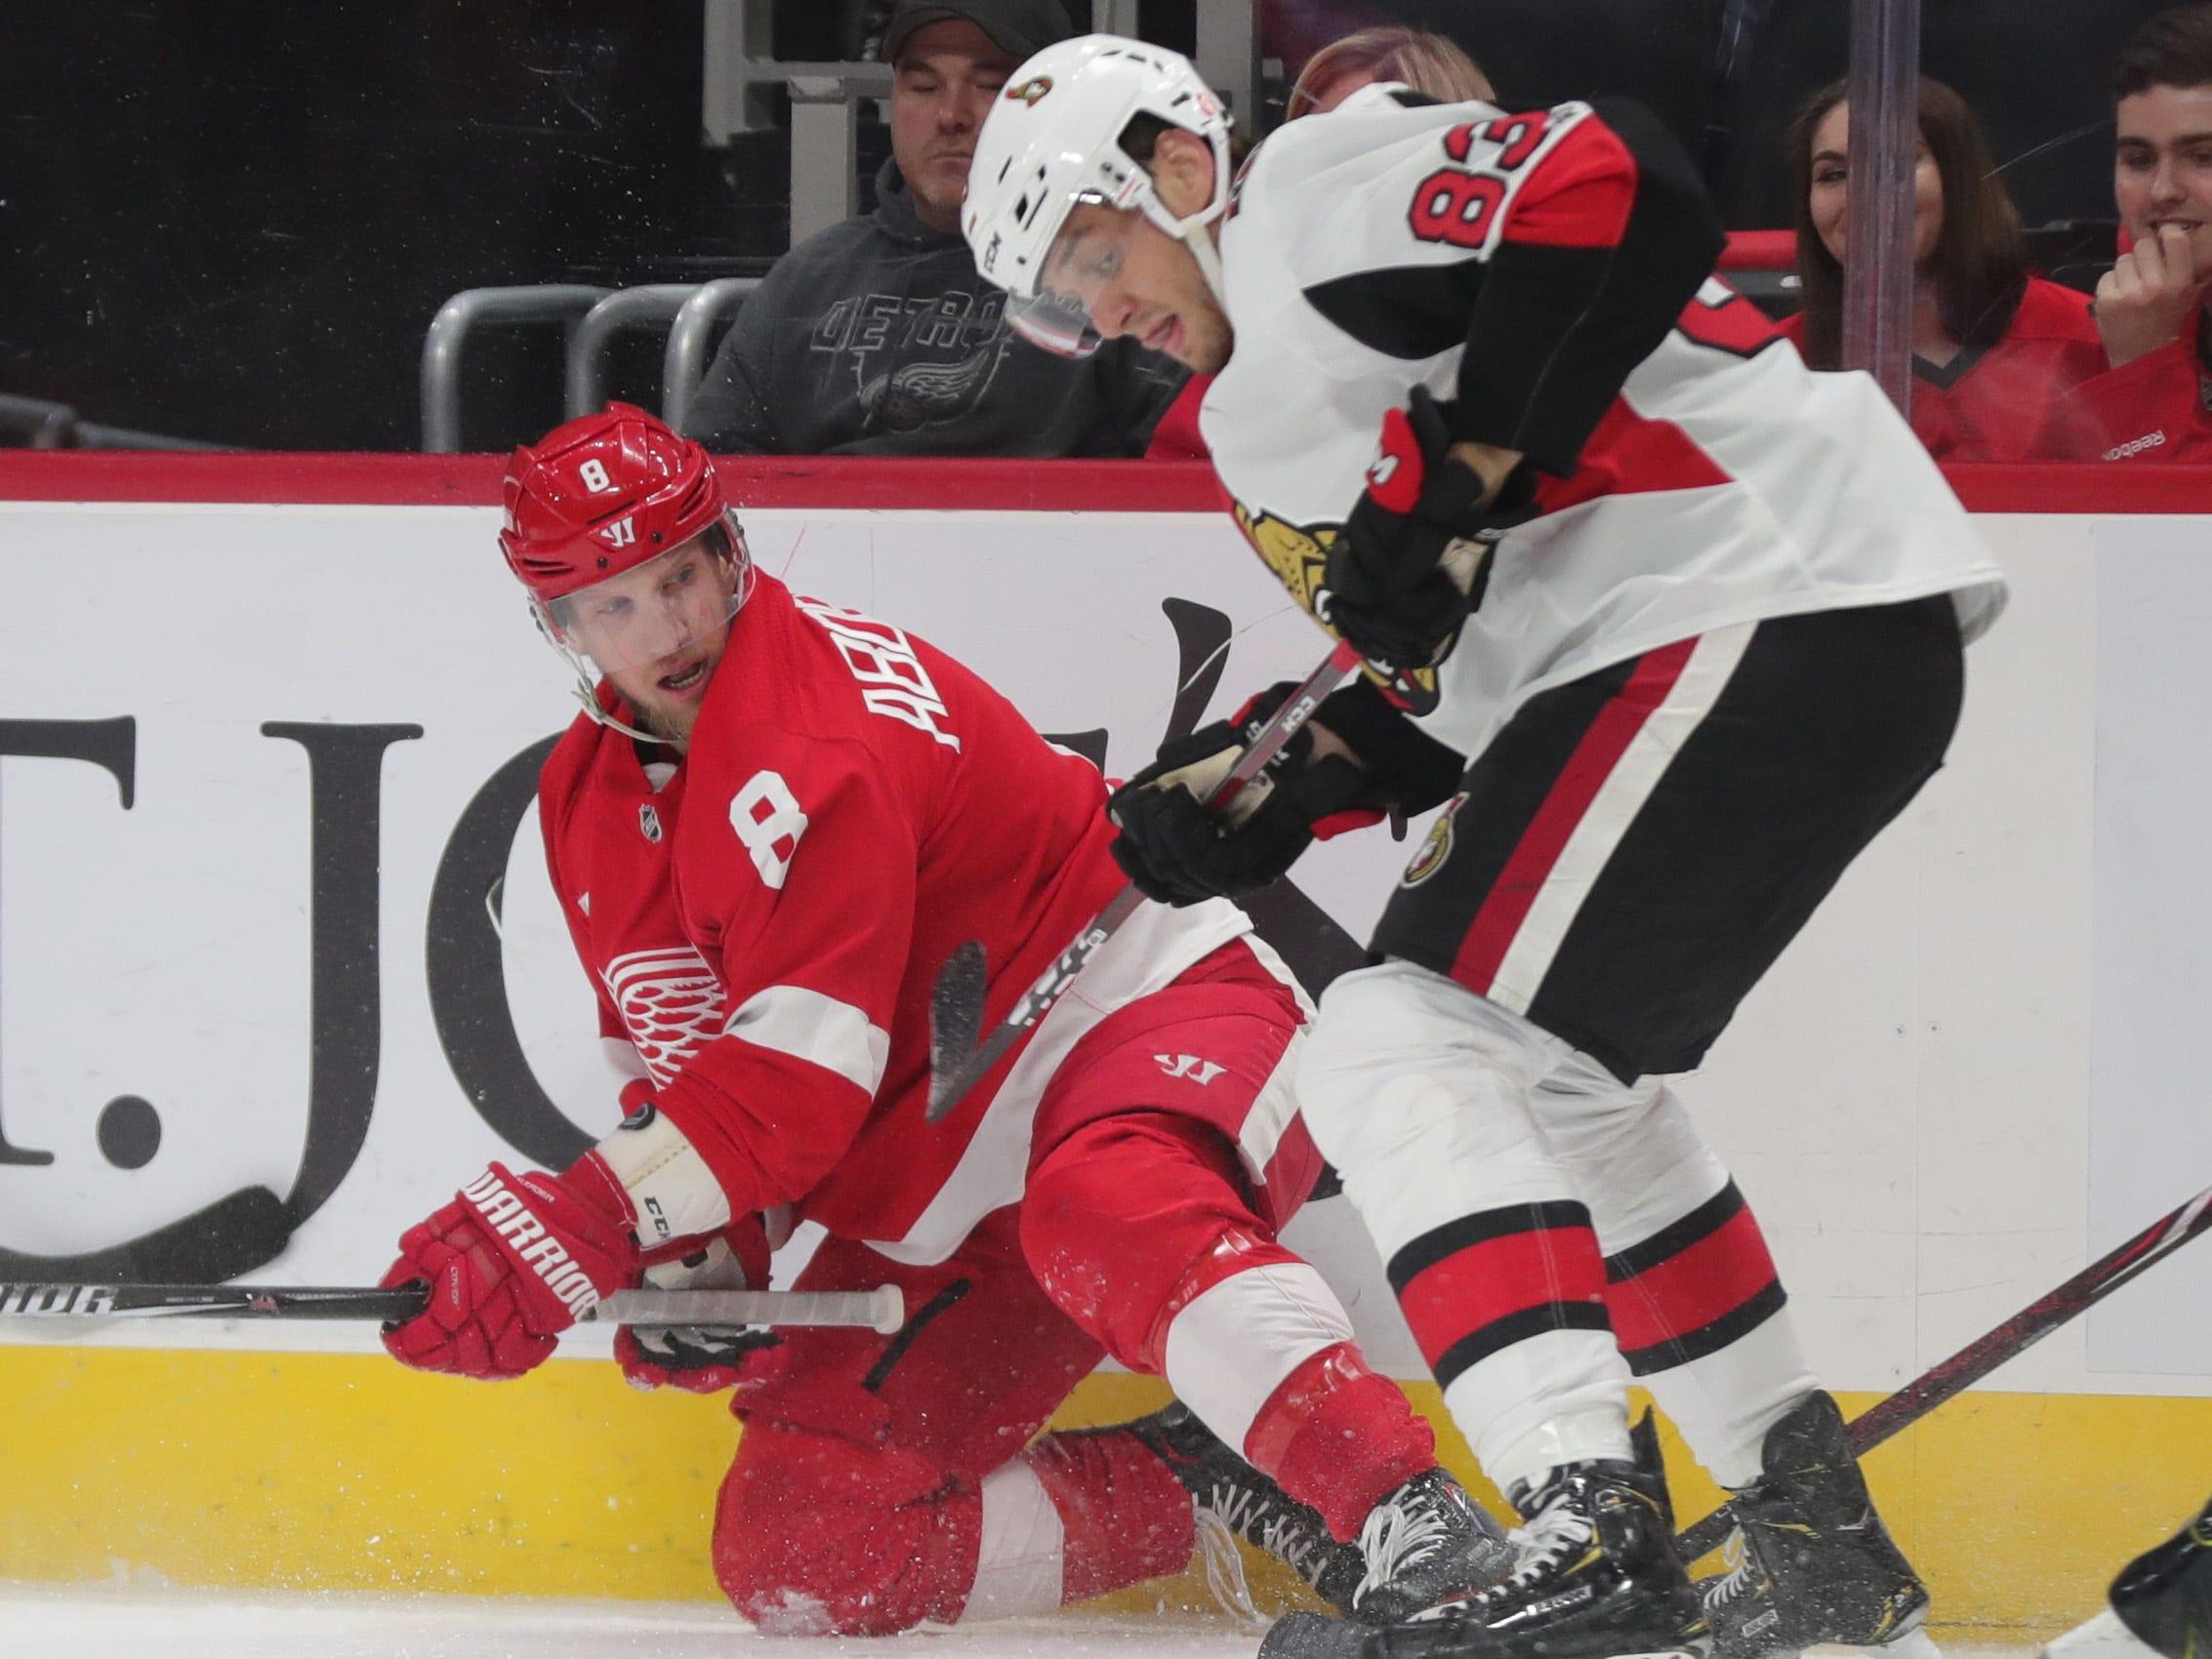 Detroit Red Wings forward Justin Ablelkader goes for the puck against Ottawa Senators defenseman Christian Jaros during on Thursday, Feb. 14, 2019, in Detroit.